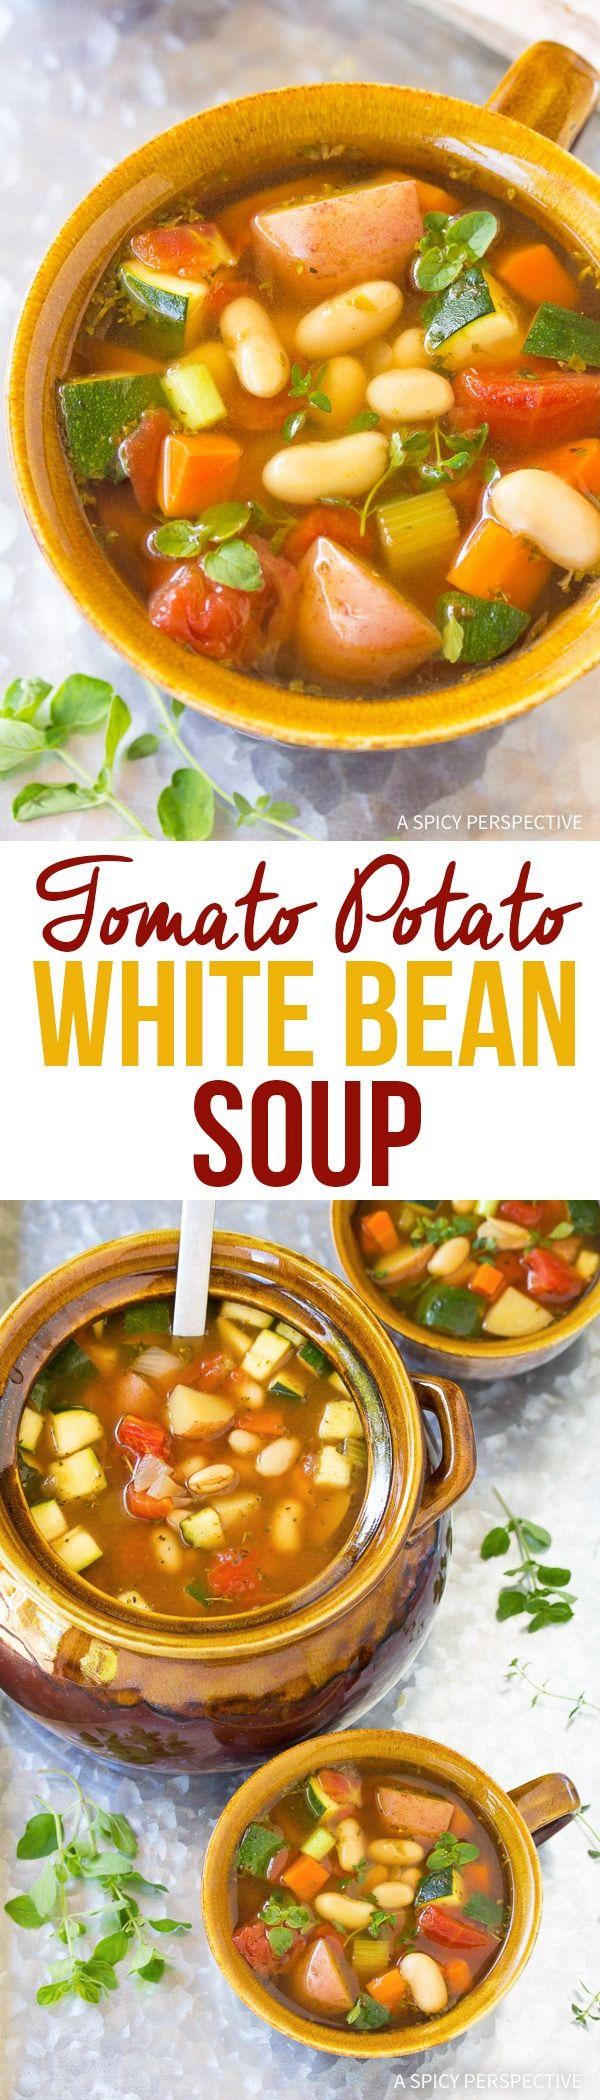 Light and Healthy Tomato Potato White Bean Soup Recipe via @spicyperspectiv